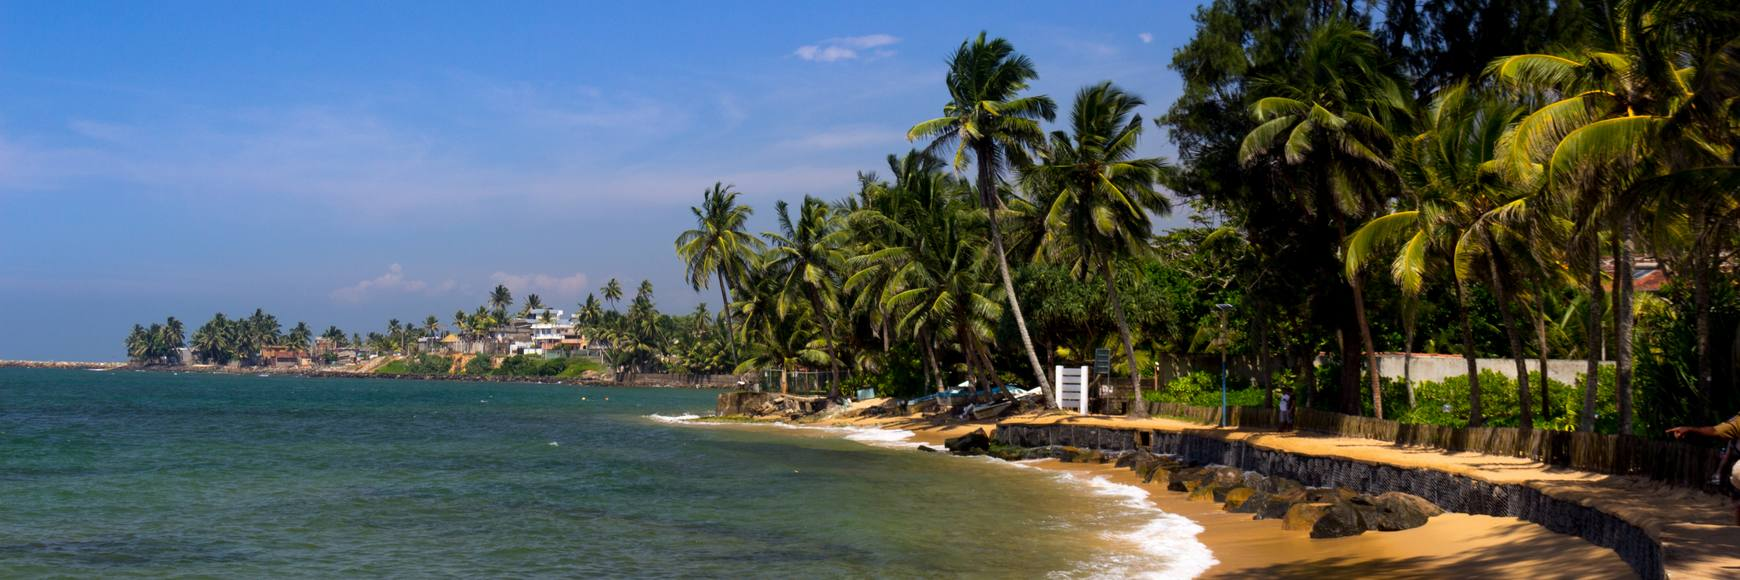 noleggio barca a motore Sri Lanka